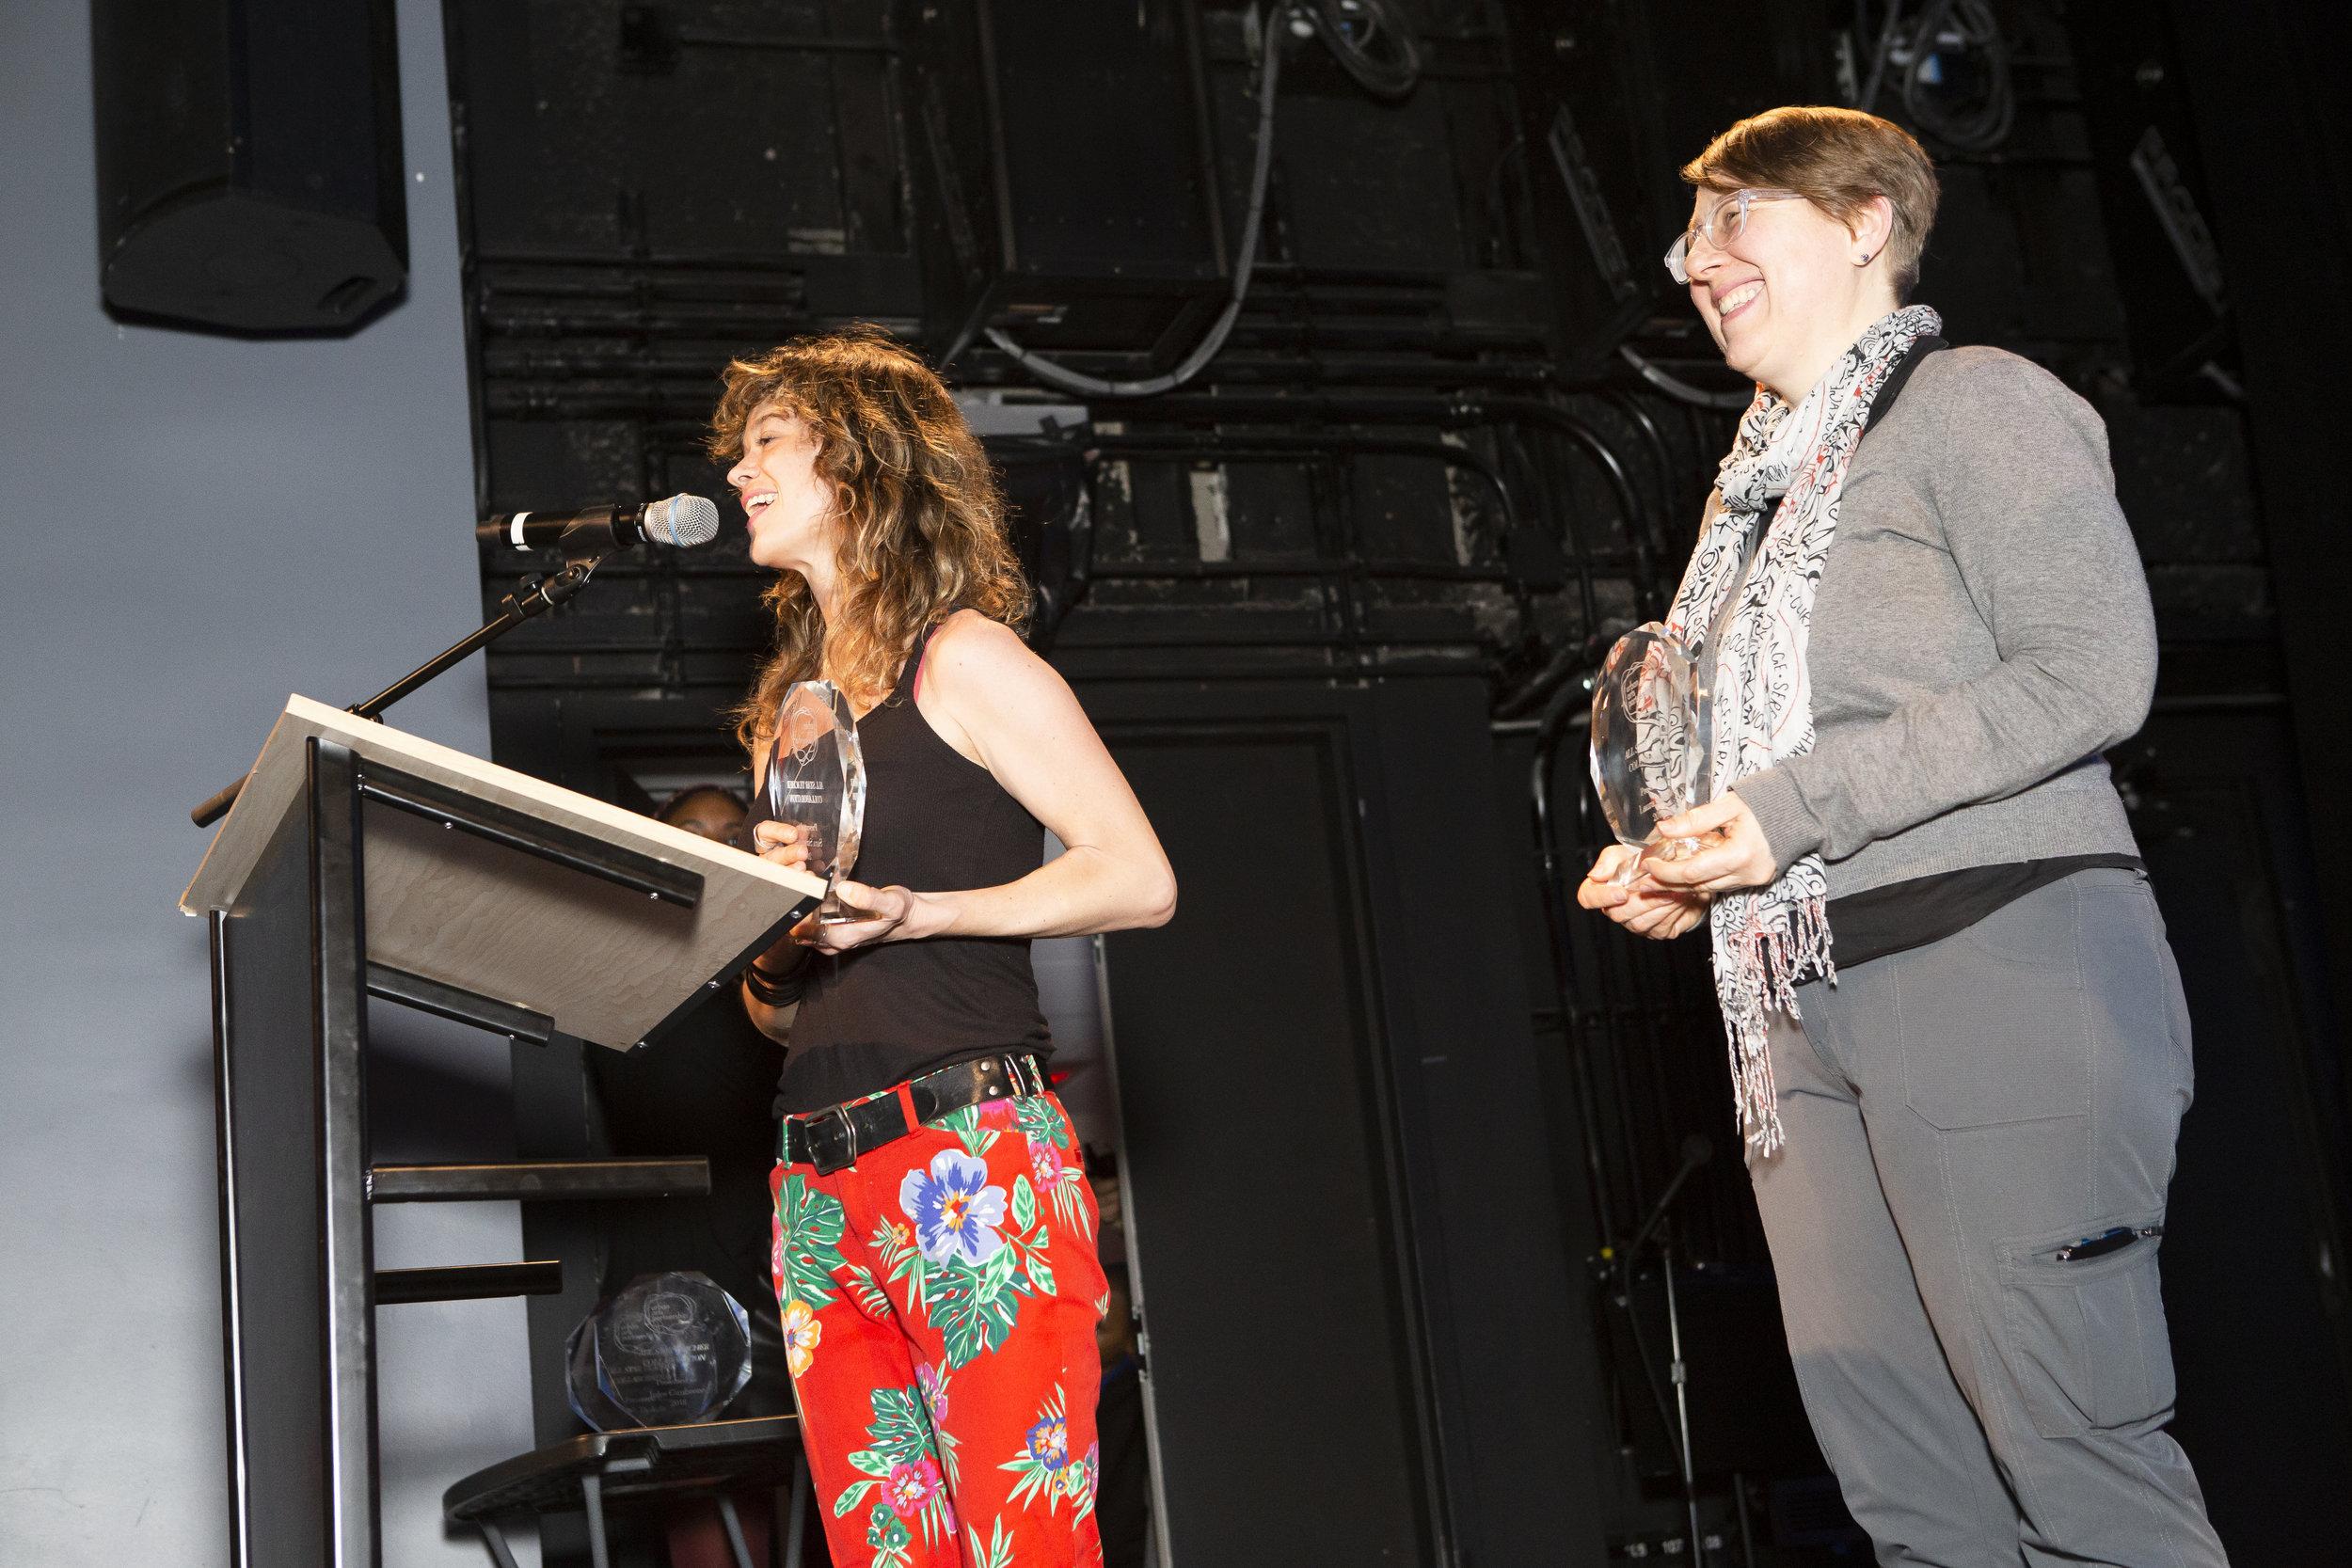 Teacher of the year award, 2018